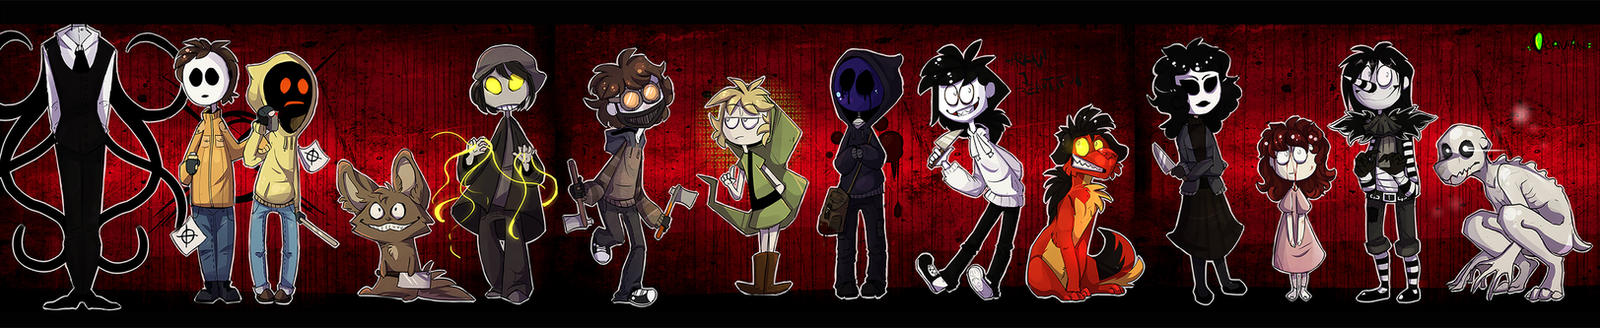 |Creepypasta Fanart| Cartoon CP Monsters